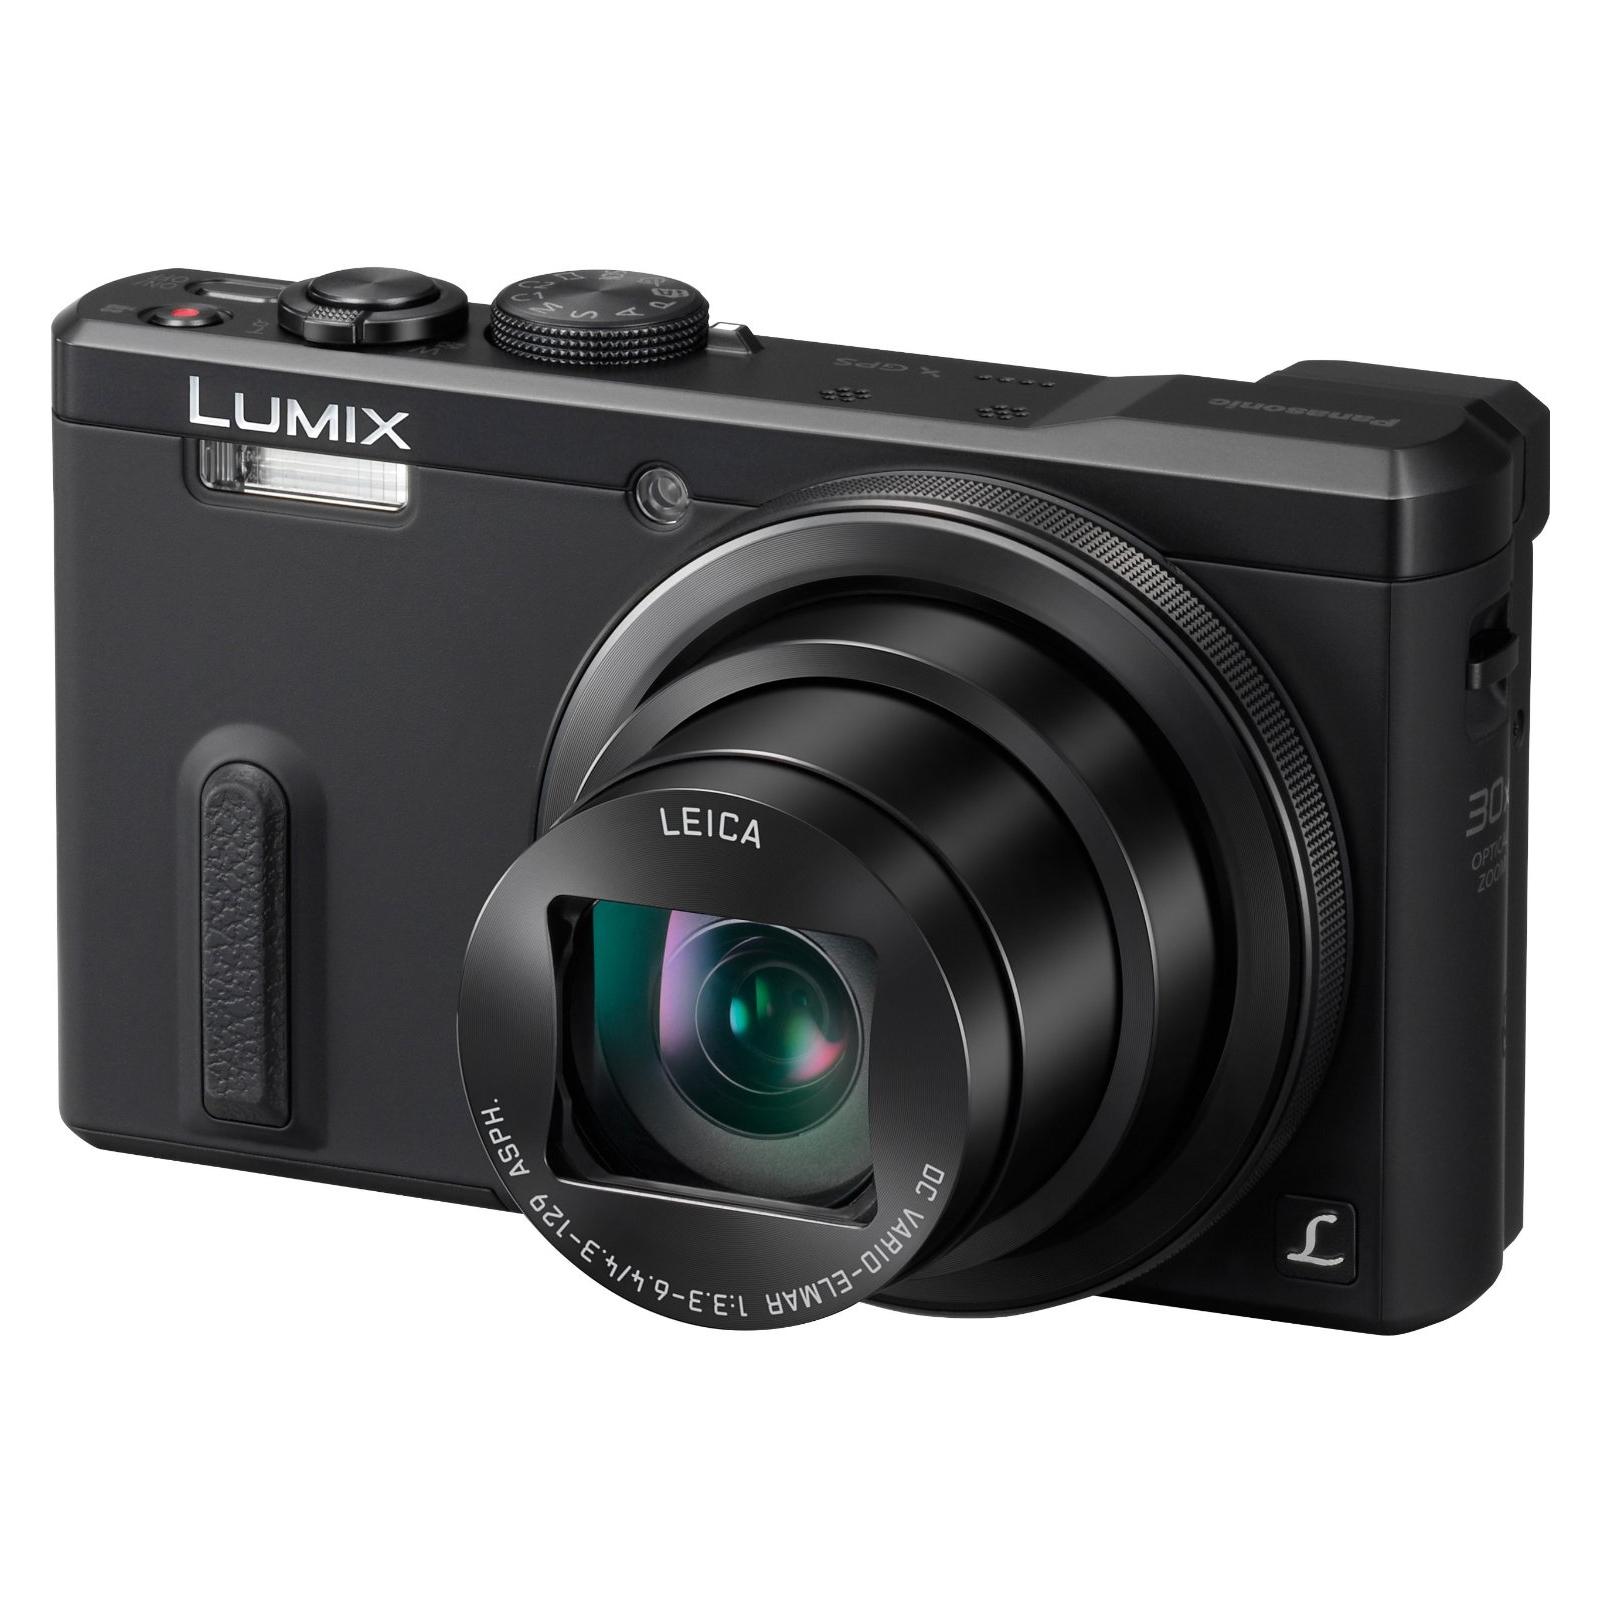 Цифровой фотоаппарат PANASONIC Lumix DMC-TZ60EE-K (DMC-TZ60EE-K)